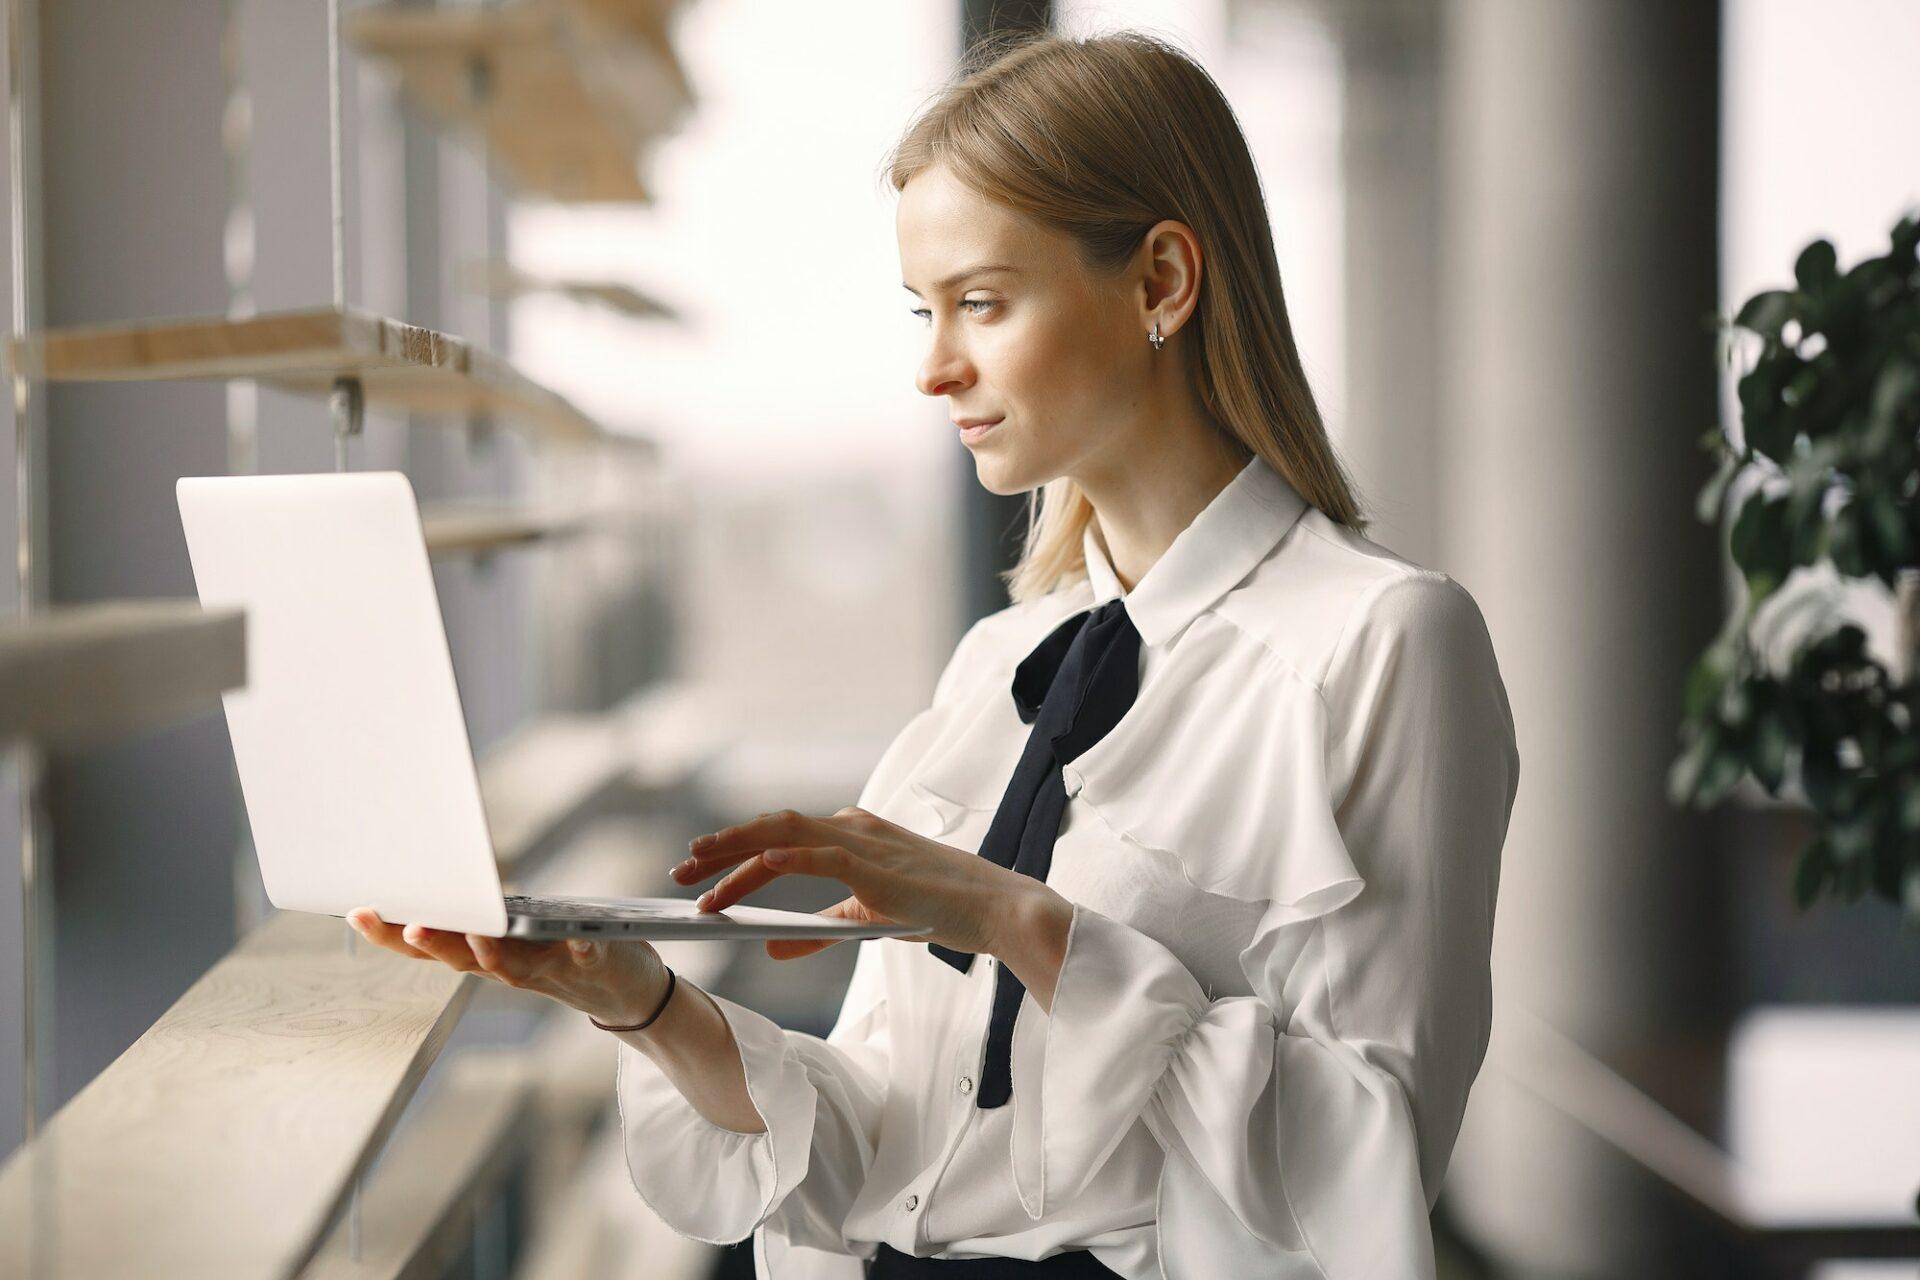 https://www.shiwaforce.com/wp-content/uploads/2020/06/focused-worker-using-laptop-in-office-lobby-4173263-1.jpg